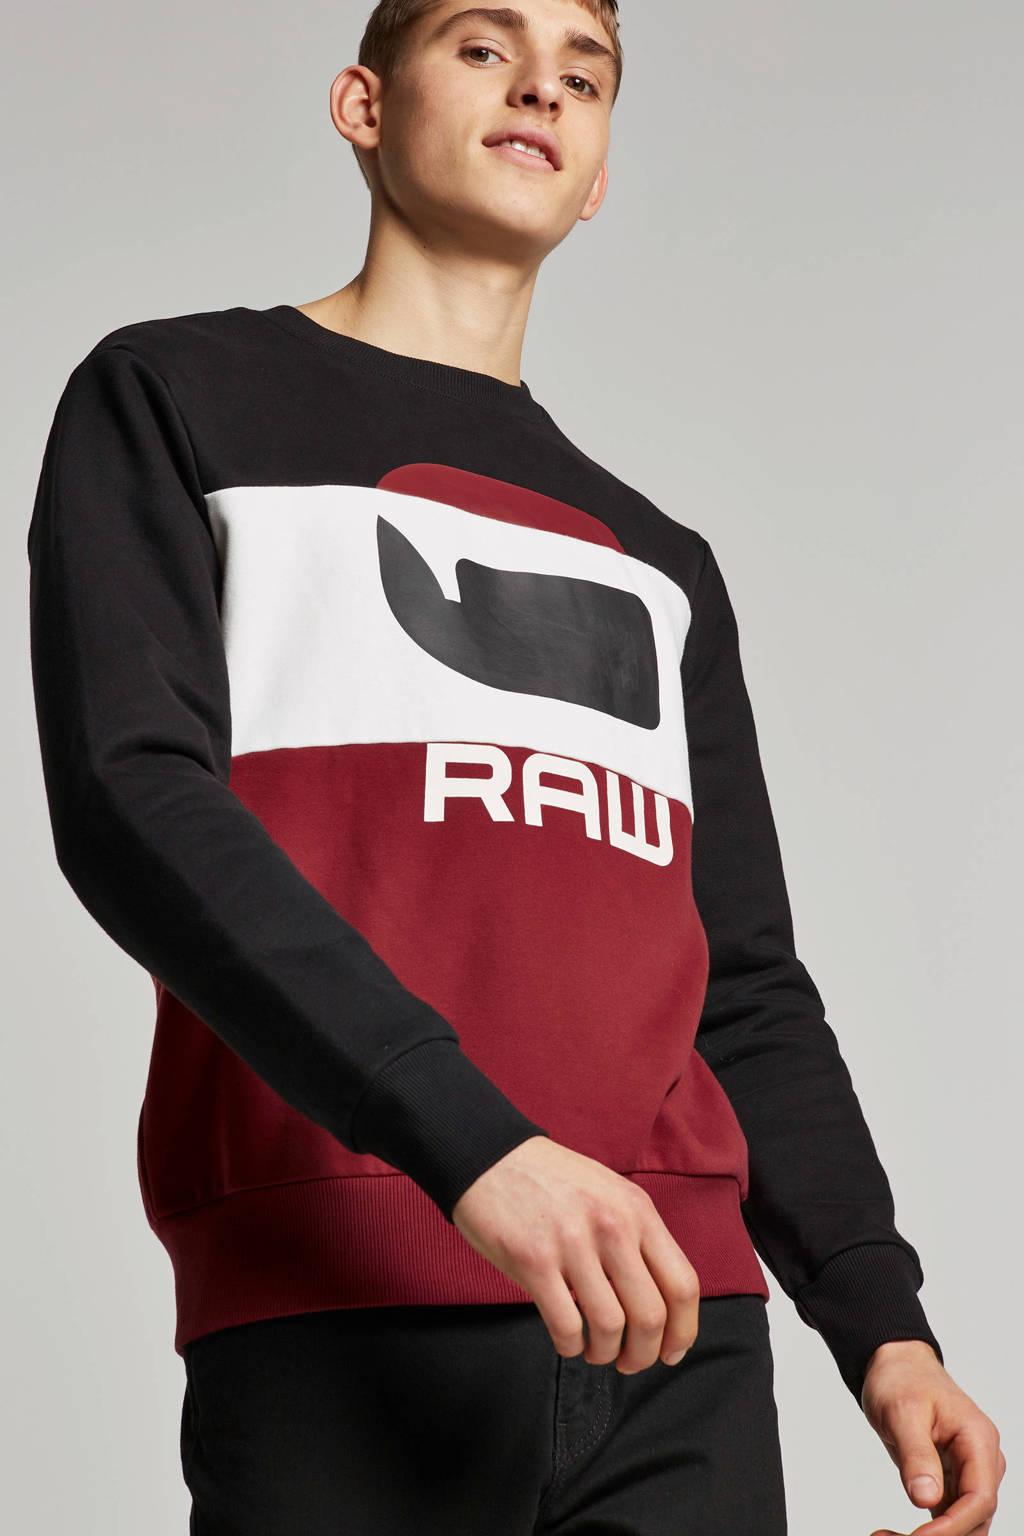 G-Star RAW sweater, Zwart/rood